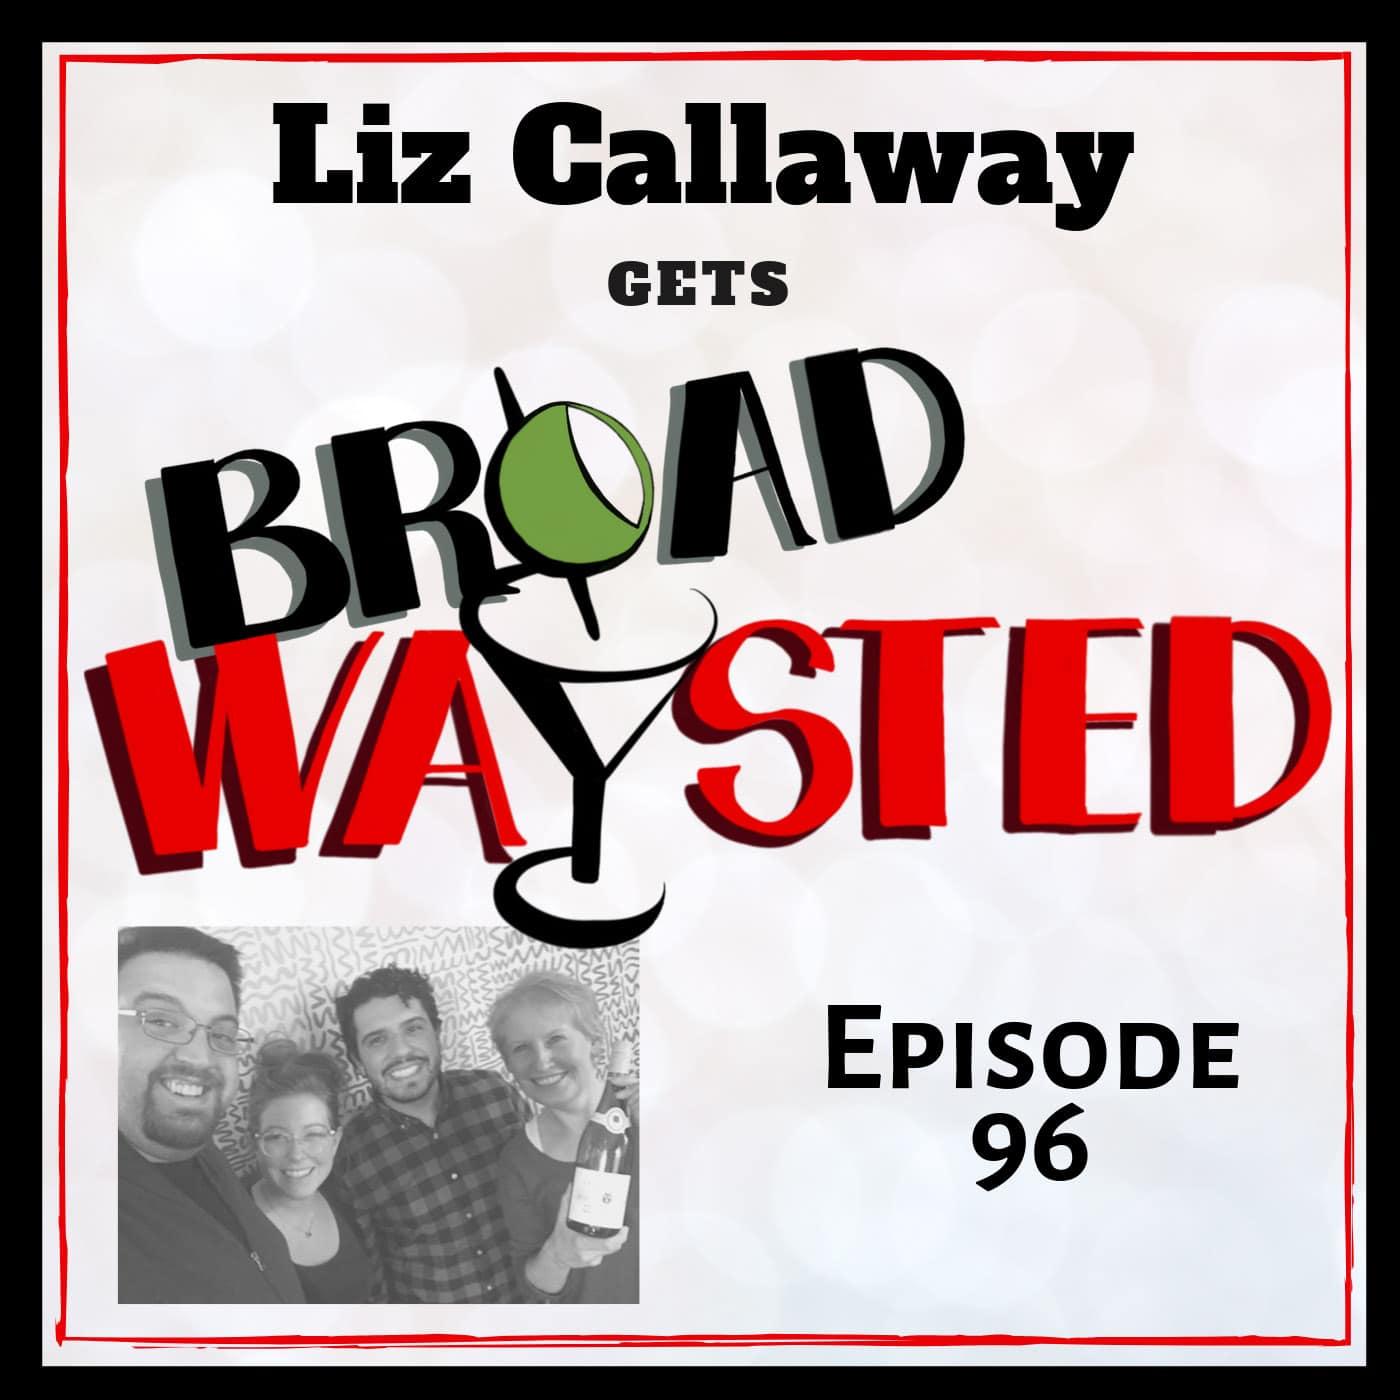 Broadwaysted Ep 96 Liz Callaway